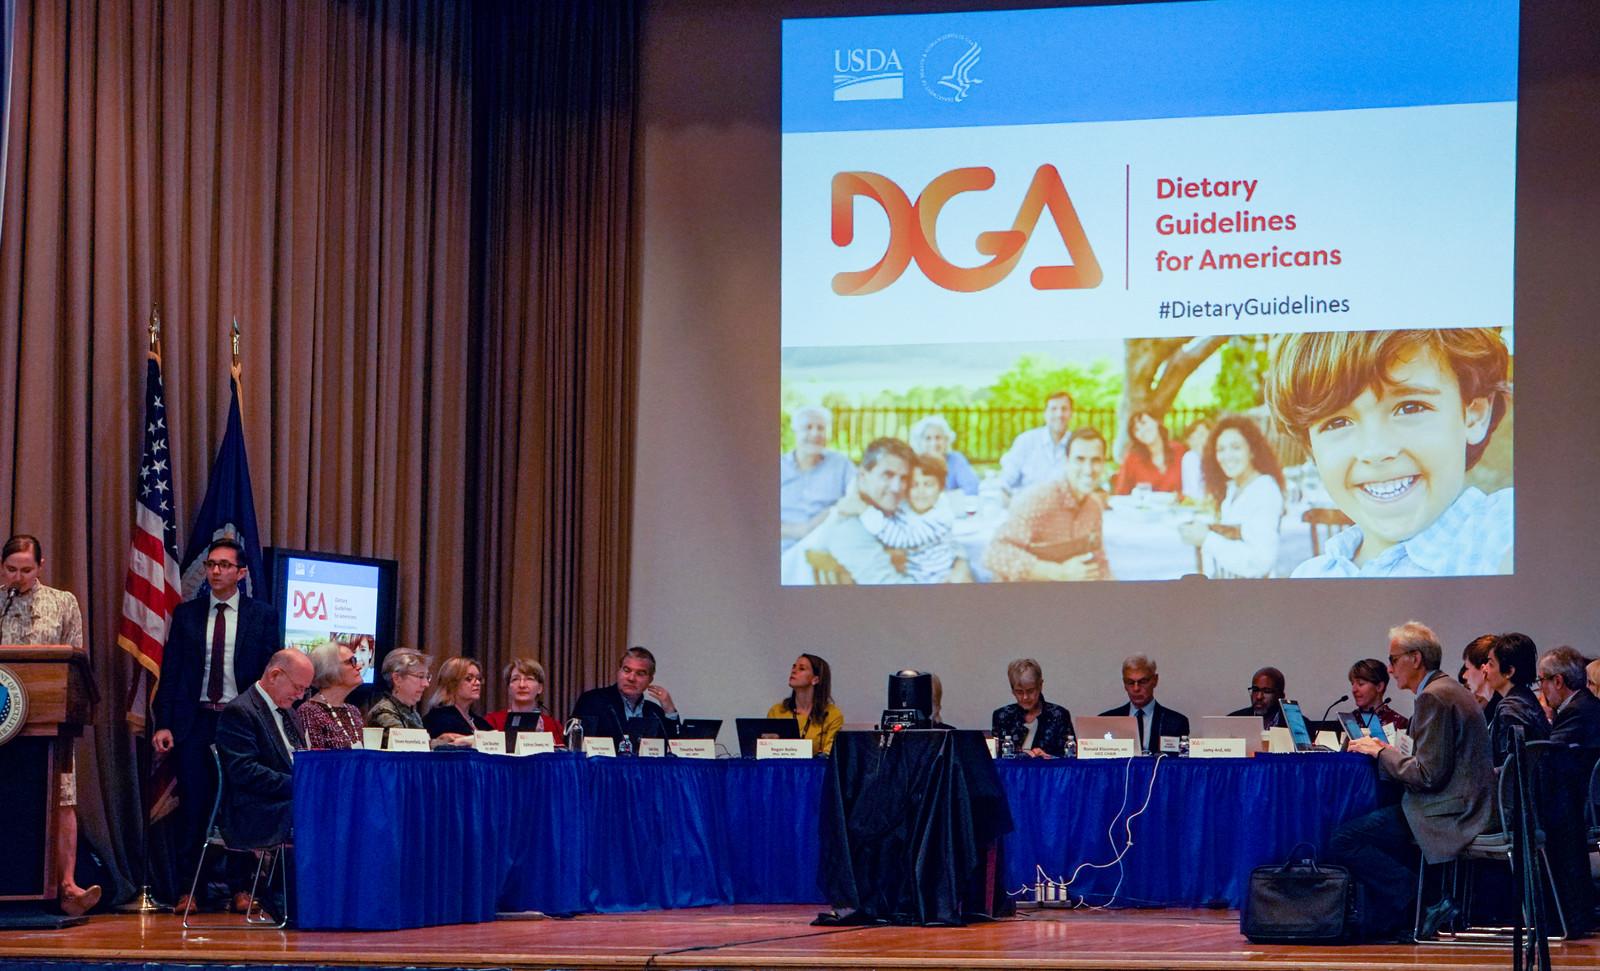 2019.10.24 USDA DGAC Committee, Washington, DC USA 297 21018